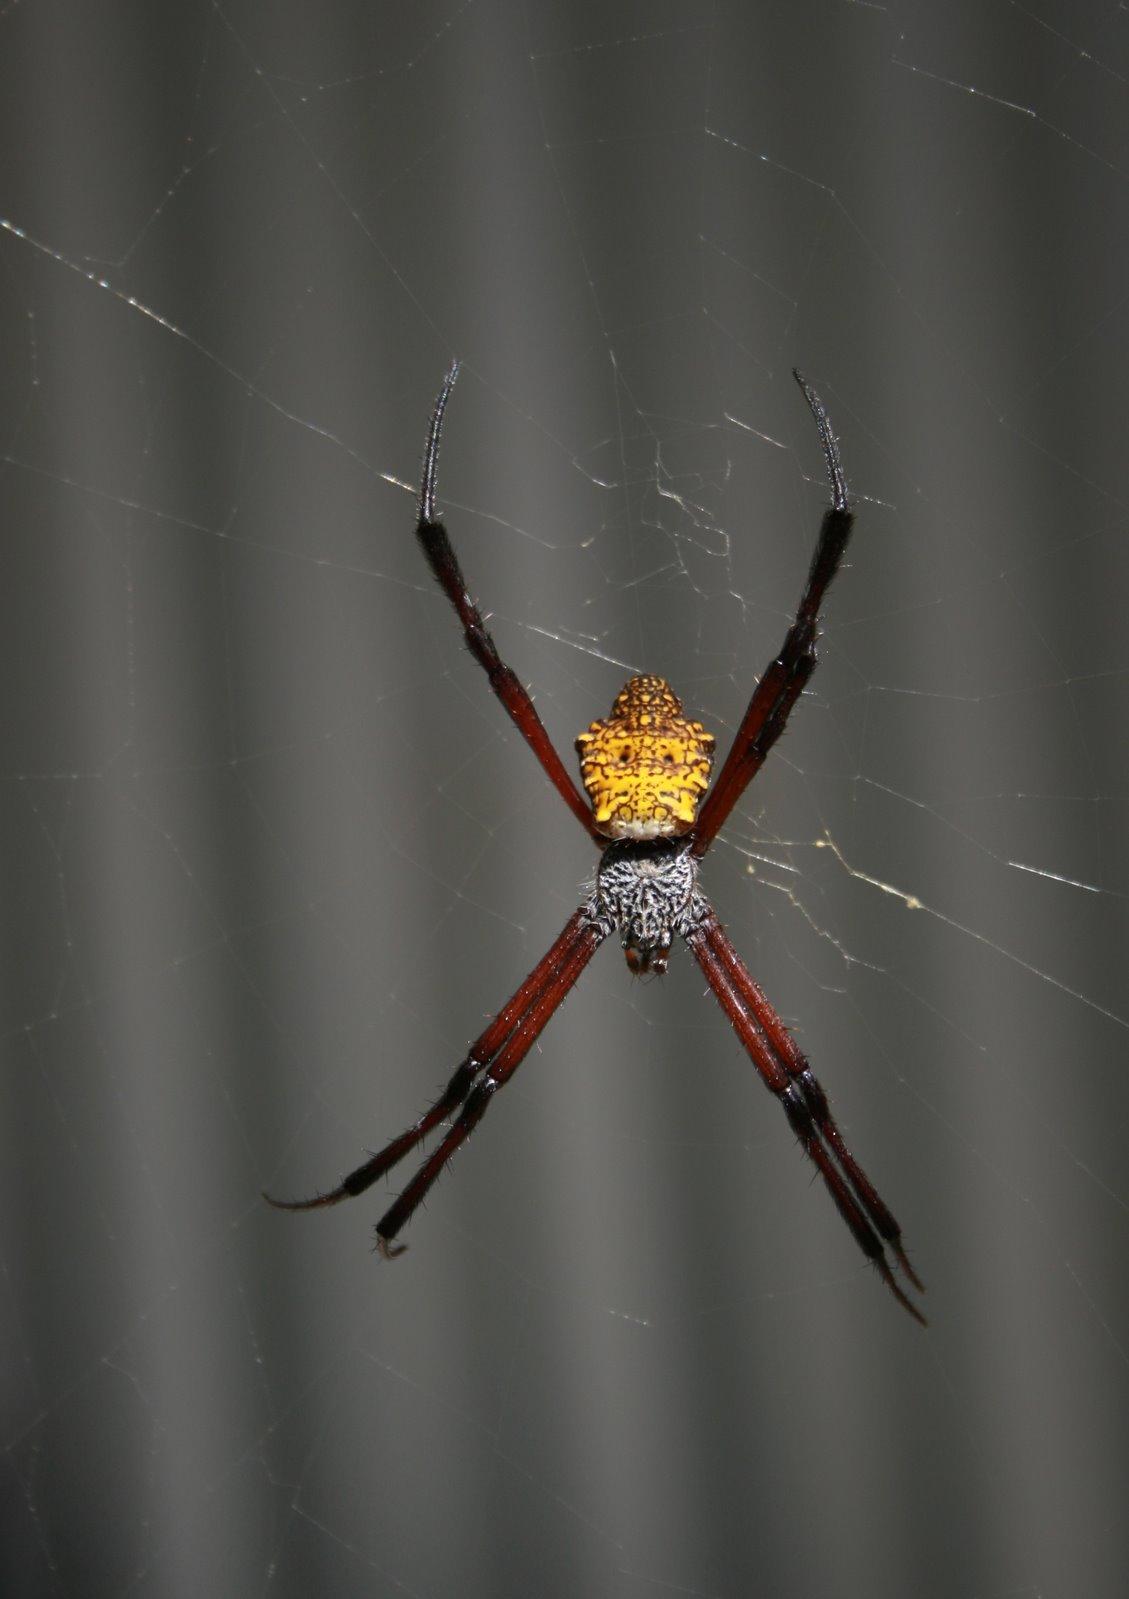 [spider-banana]